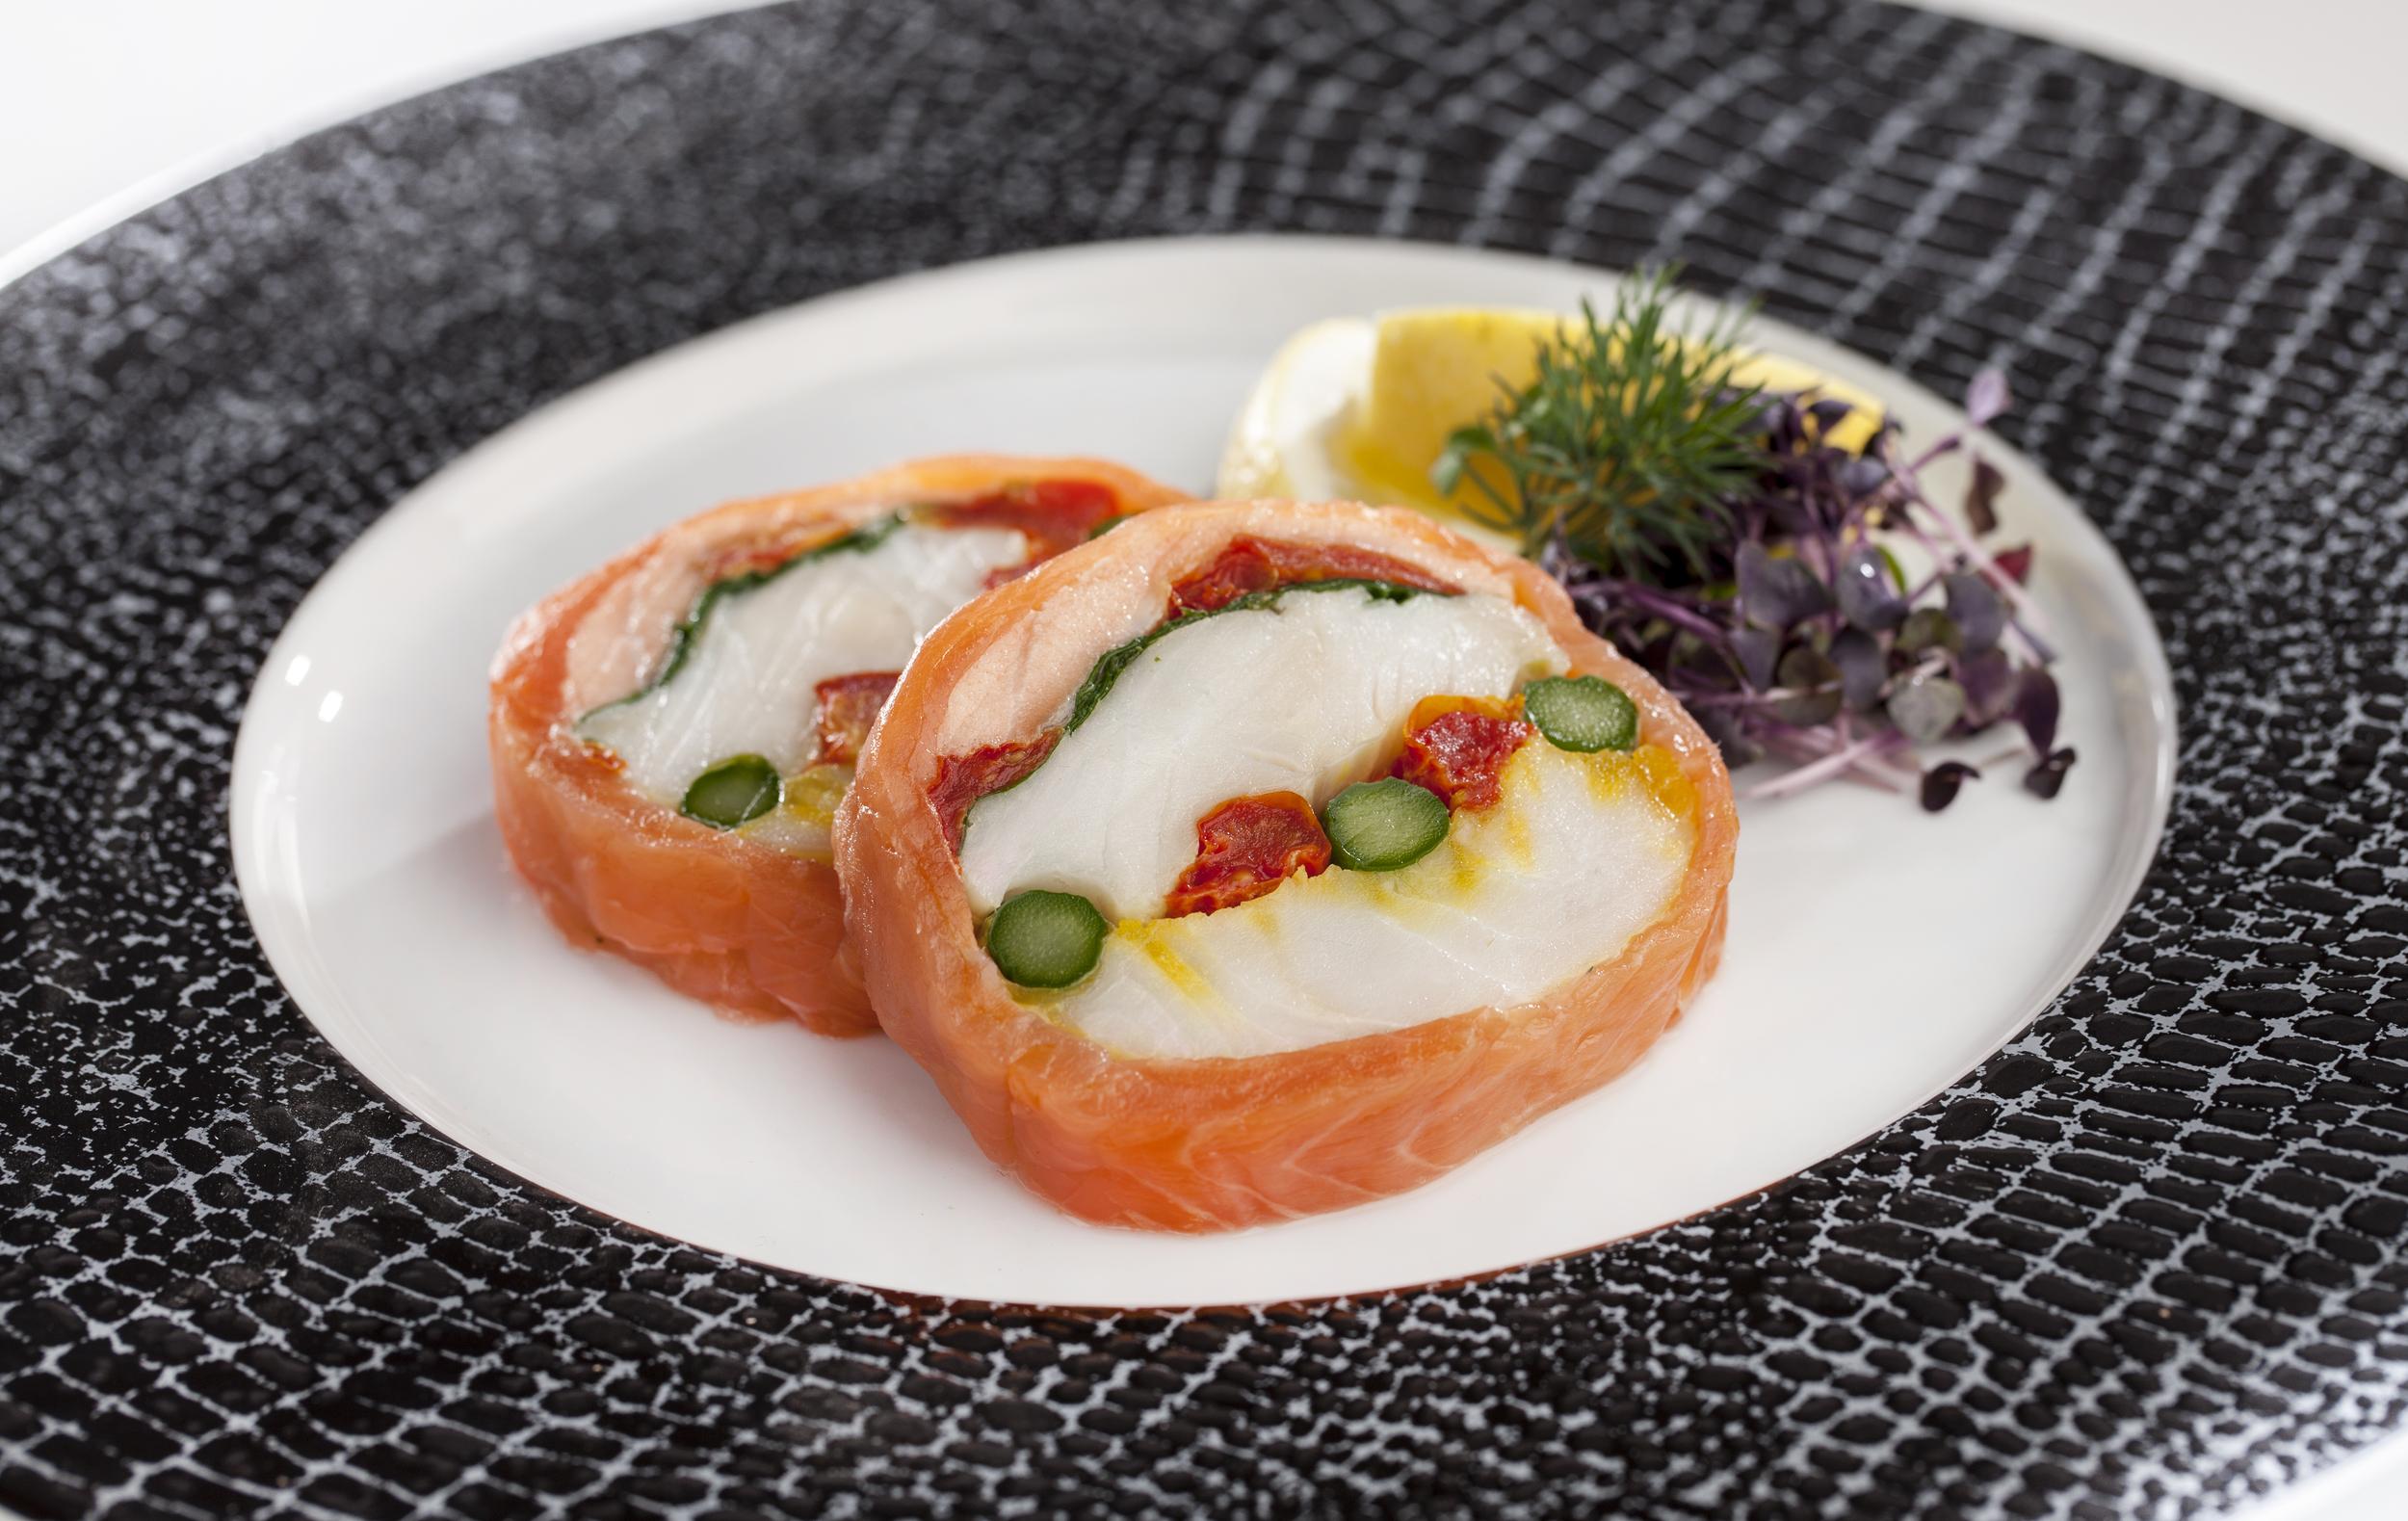 The Skinny Chef Food Stylist